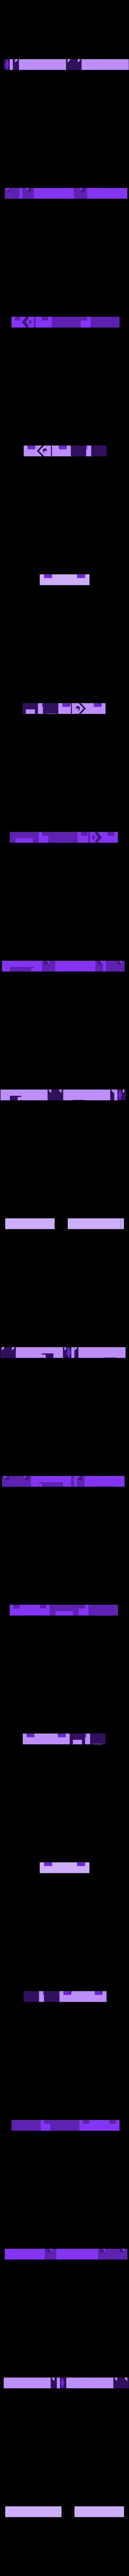 pi_cam_servo_case.stl Download free STL file Raspberry Pi Camera Case with Servo Mount • 3D printable object, ernestwallon3D